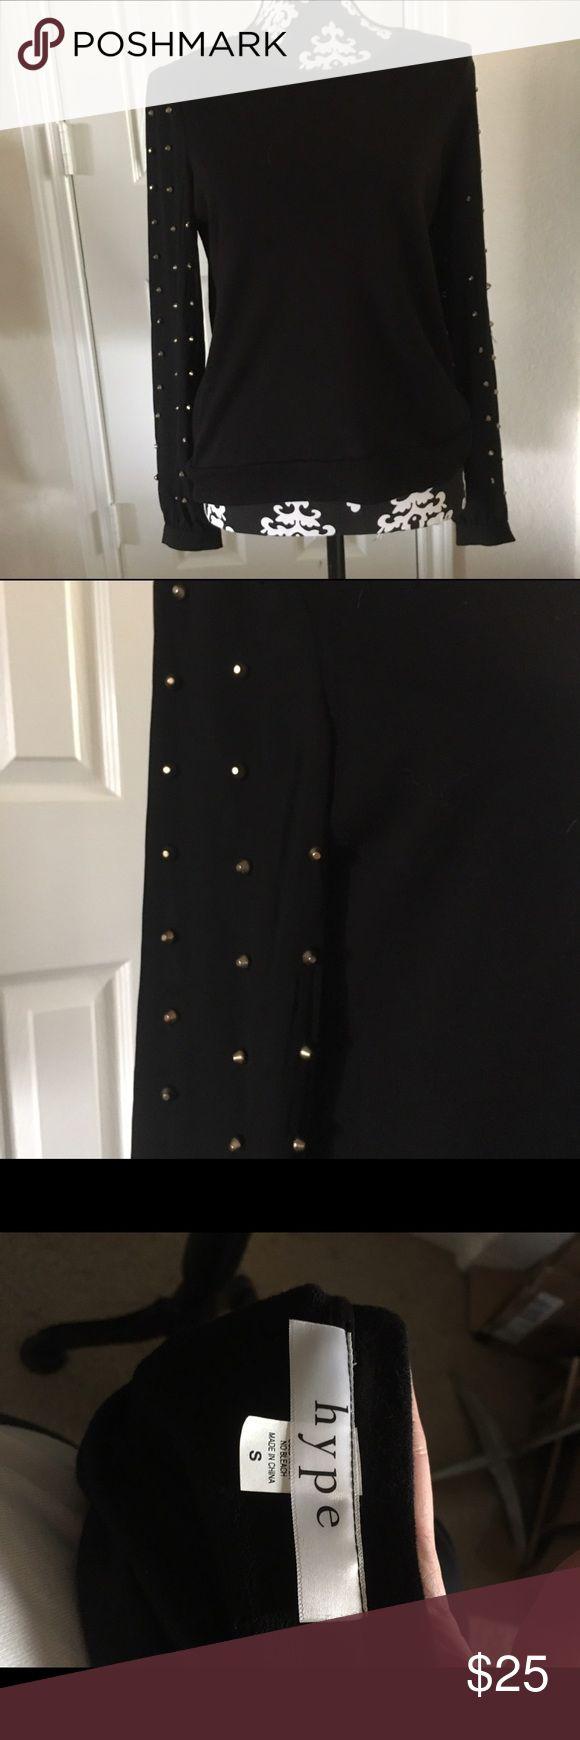 Hype Long Sleeve Top Black Hype Long Sleeve Top.  Body of Blouse is Like a Sweatshirt; Sleeves Sheer w/Brass Grommets Hype Tops Blouses